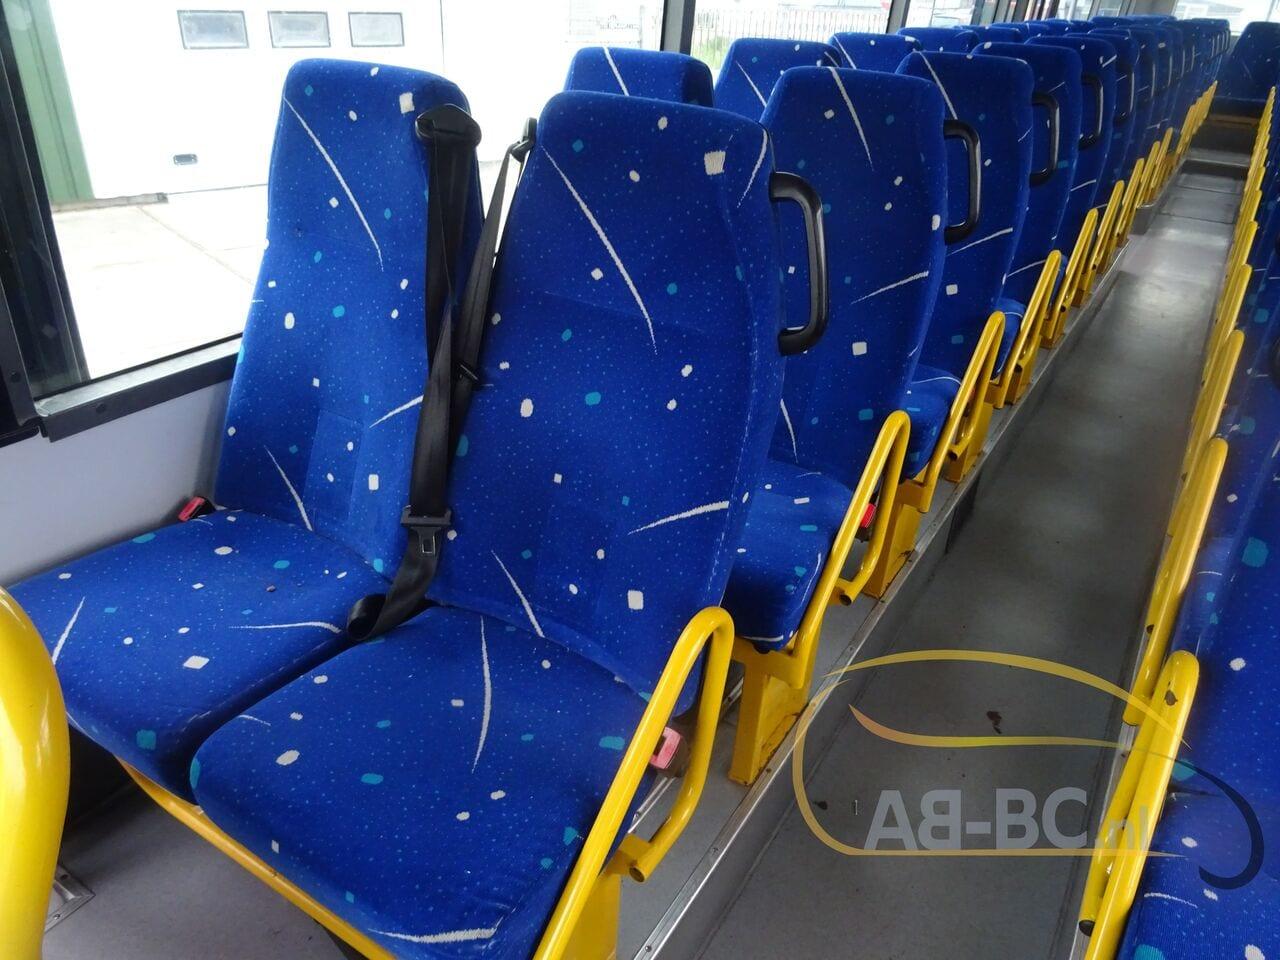 interurban-busIVECO-Irisbus-Recreo-64-Seats---1626160097350908329_big_861513fecf41f2845d06c4671b0ff830--21071309575983154500